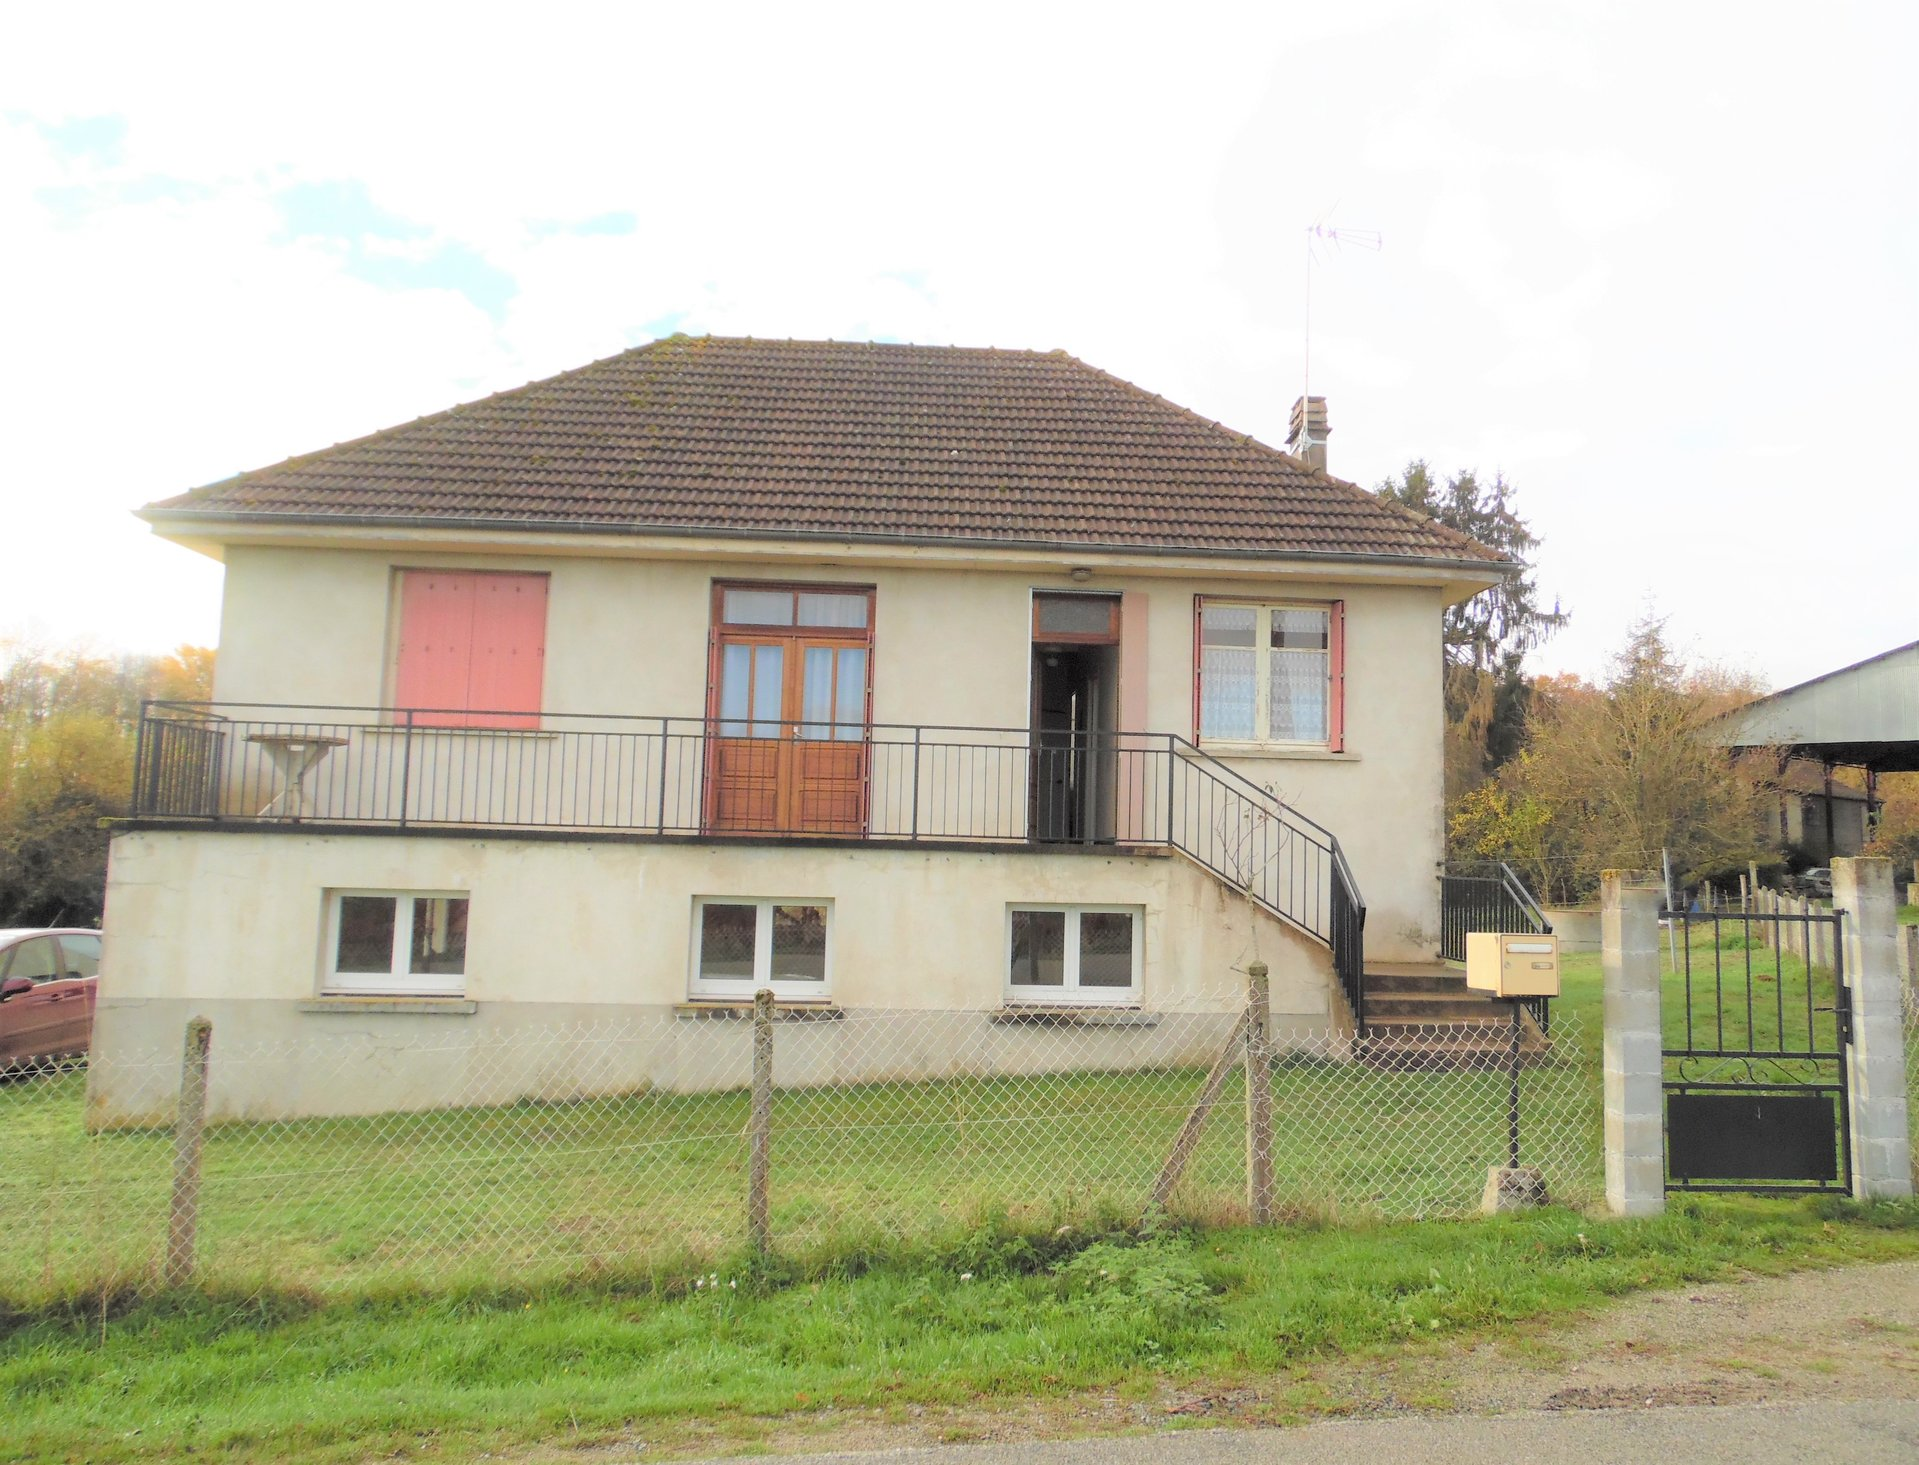 Huis met grote kelder,  garage en tuin te koop in de Creuse